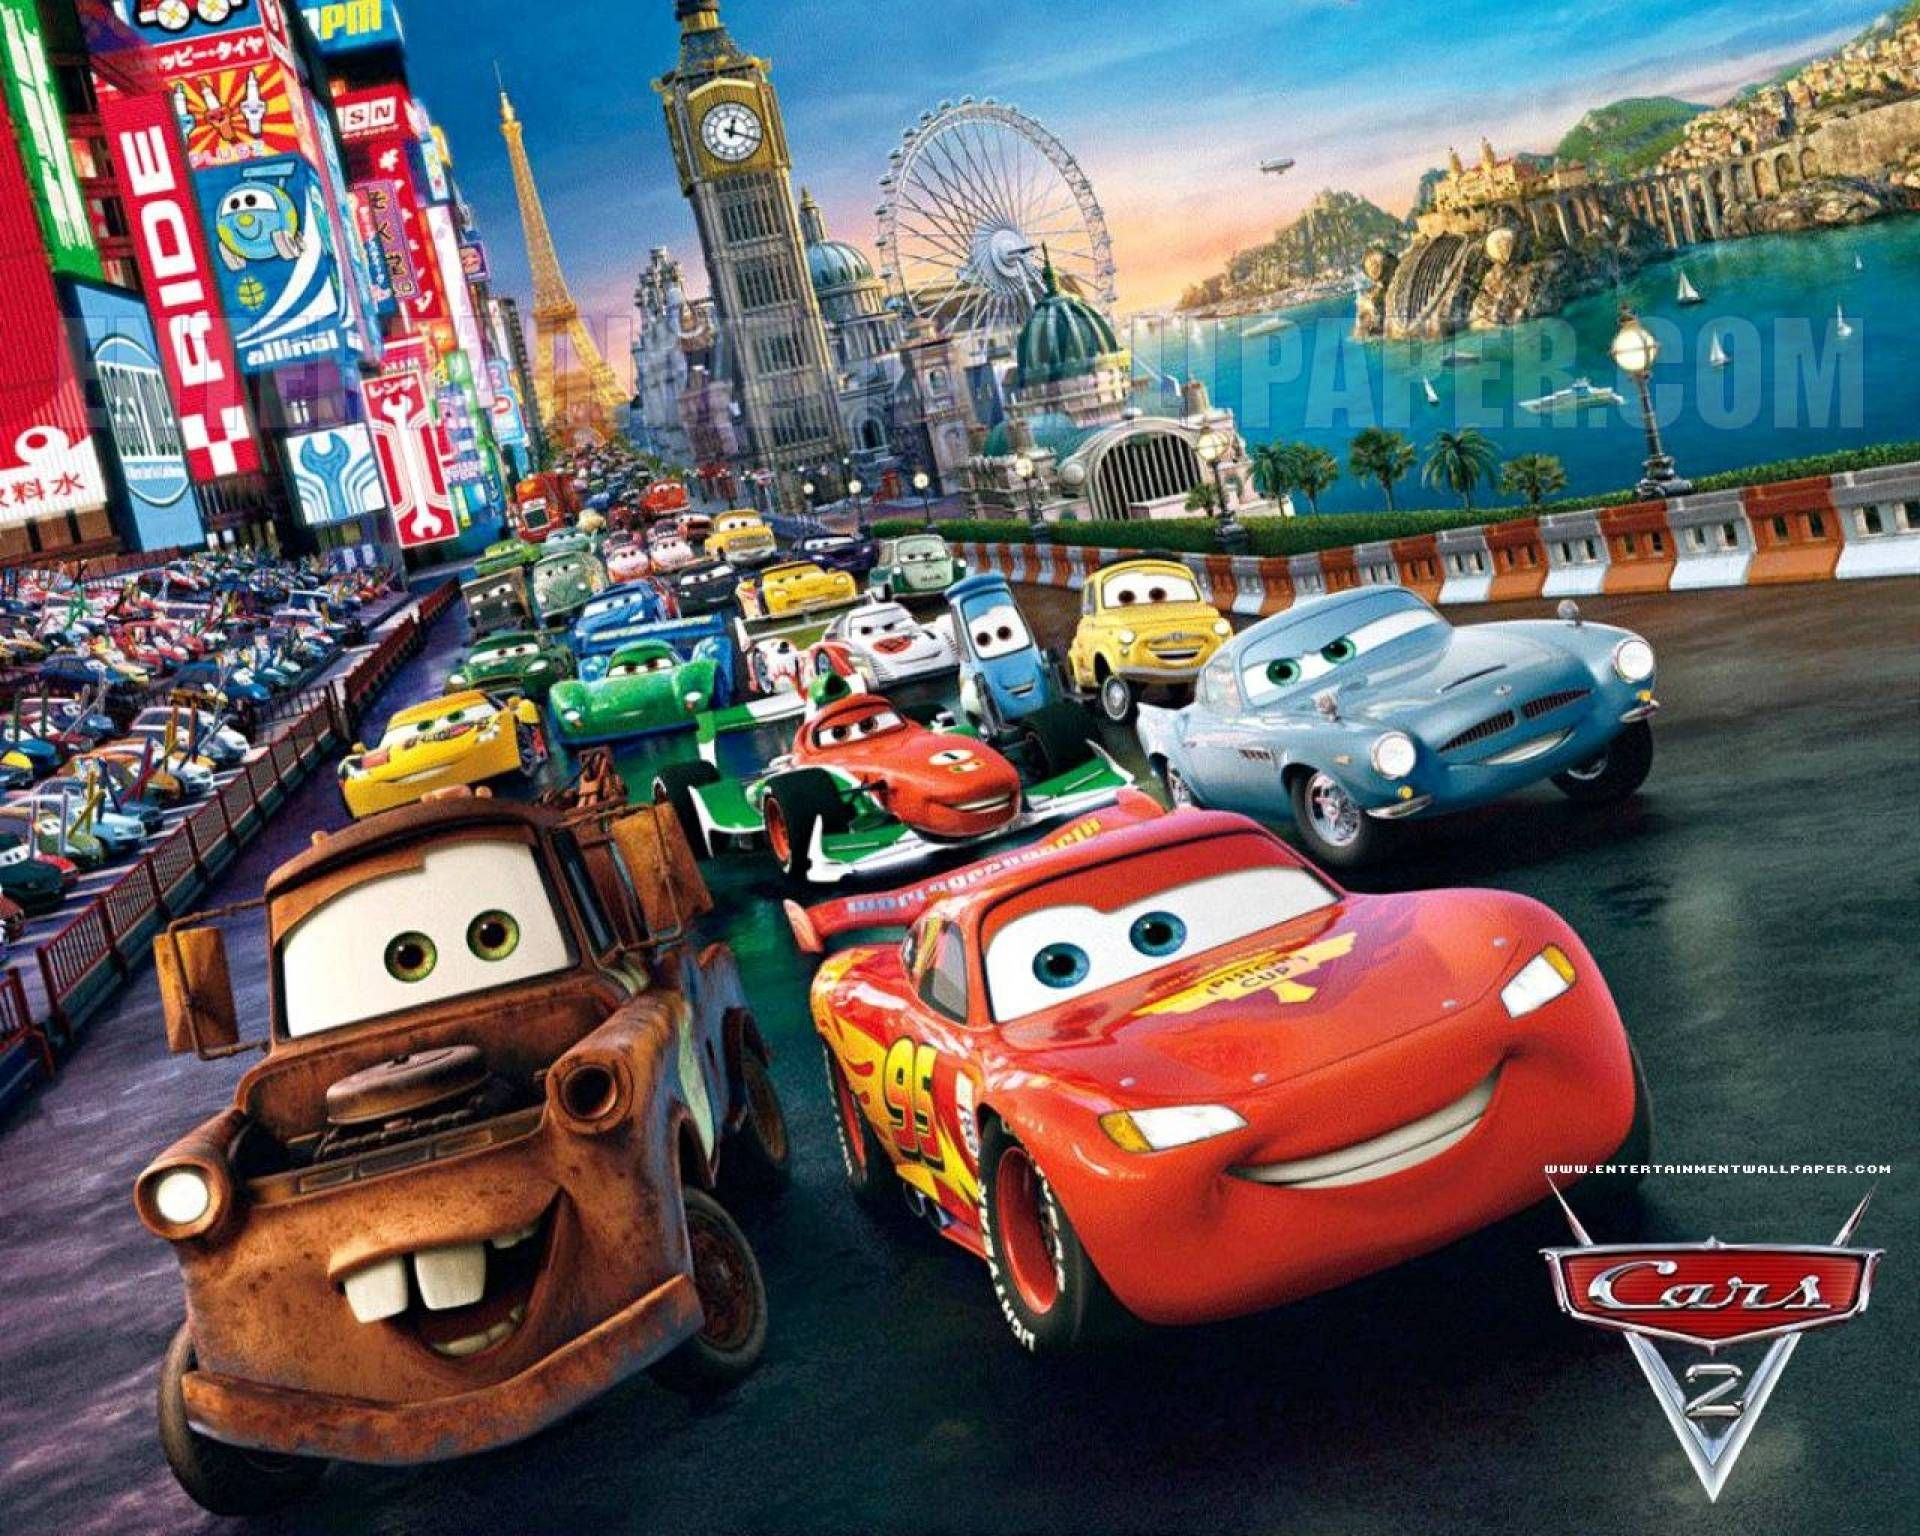 Fantastic Wallpaper Movie The Cars - c55e4c4cfc0c33ff0adbbad4019038a4  Picture_94990.jpg